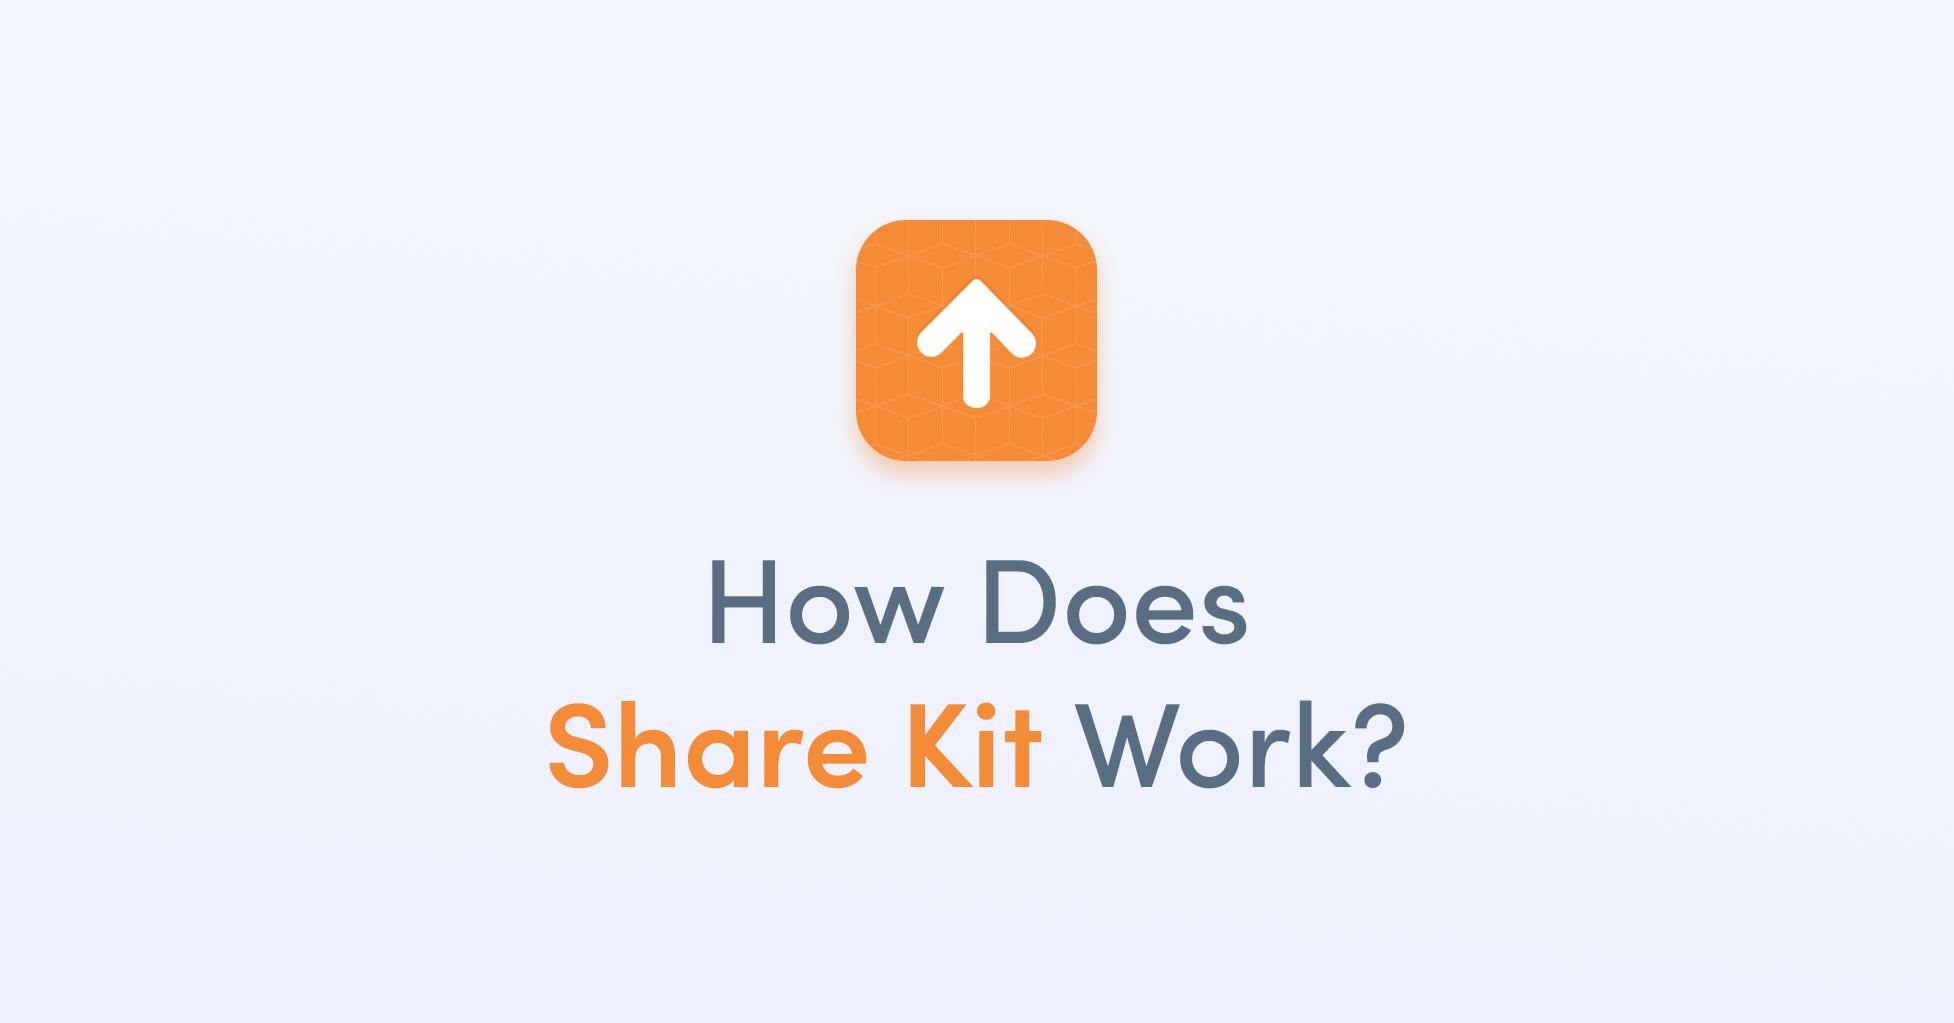 bloom share kit